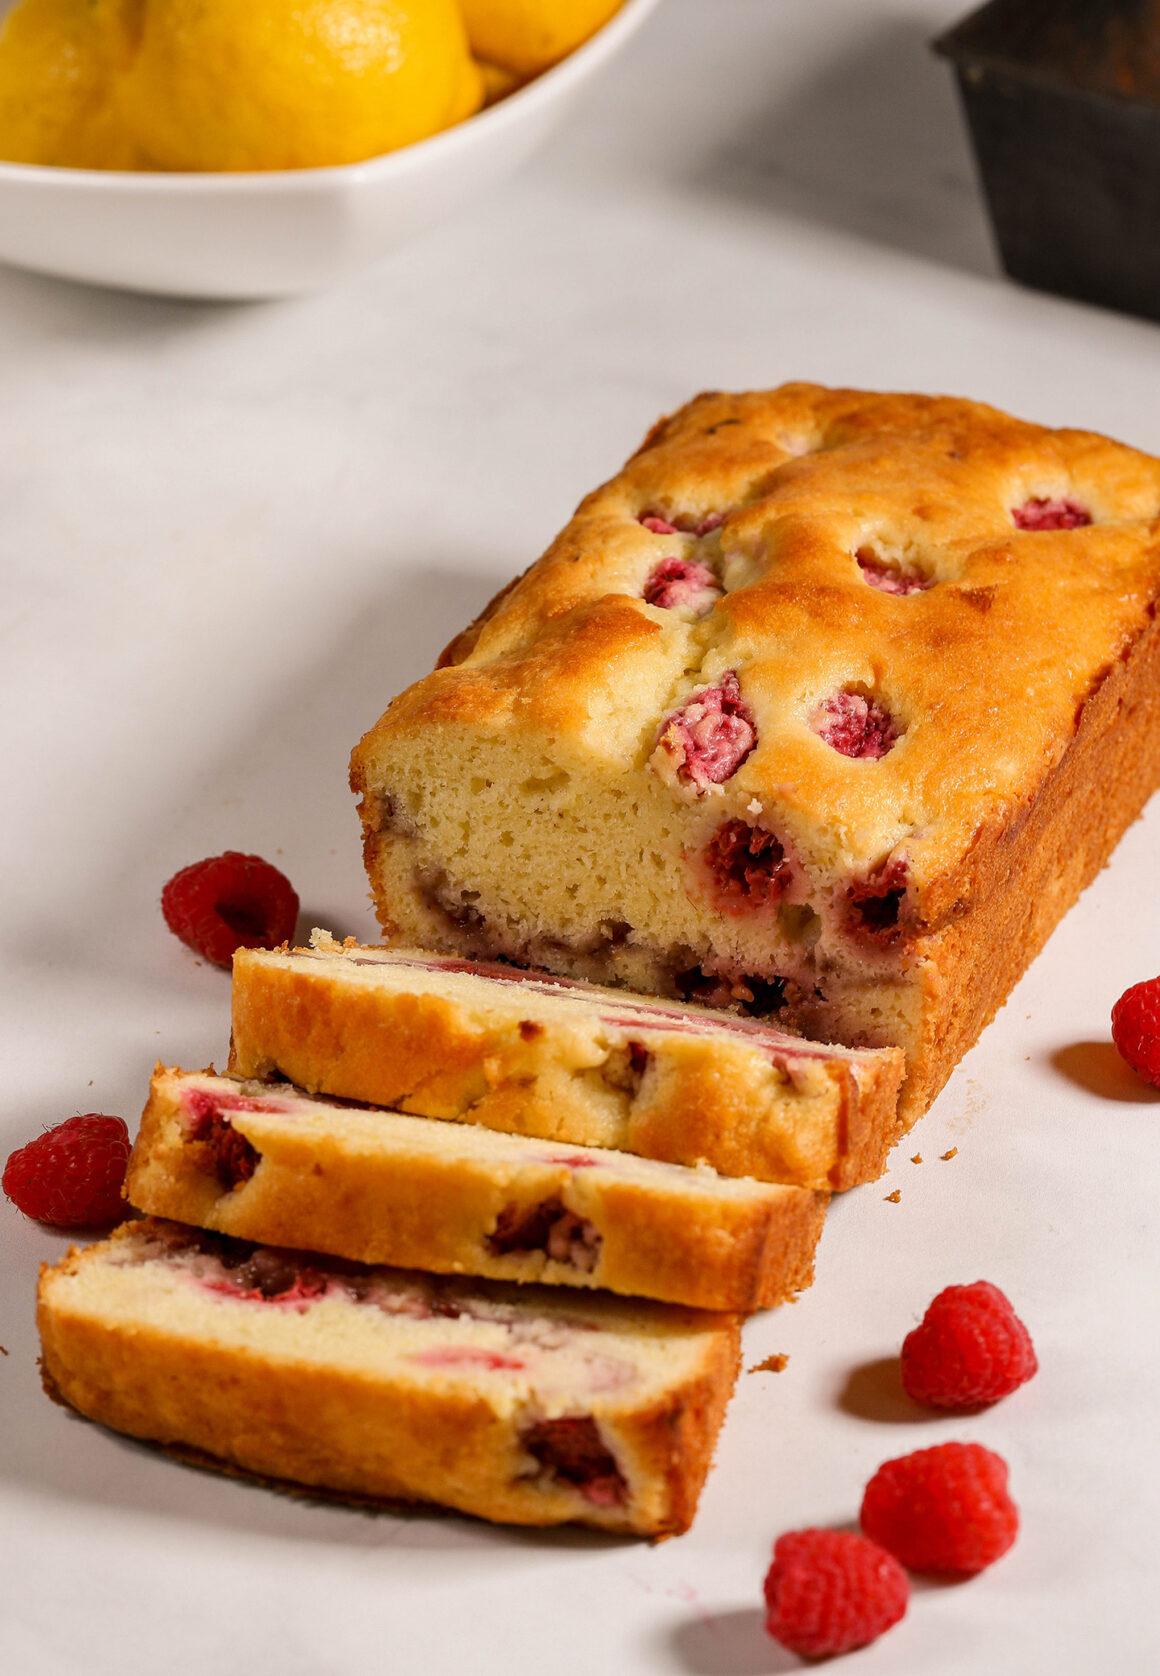 Loaf of Raspberry Bread Sliced